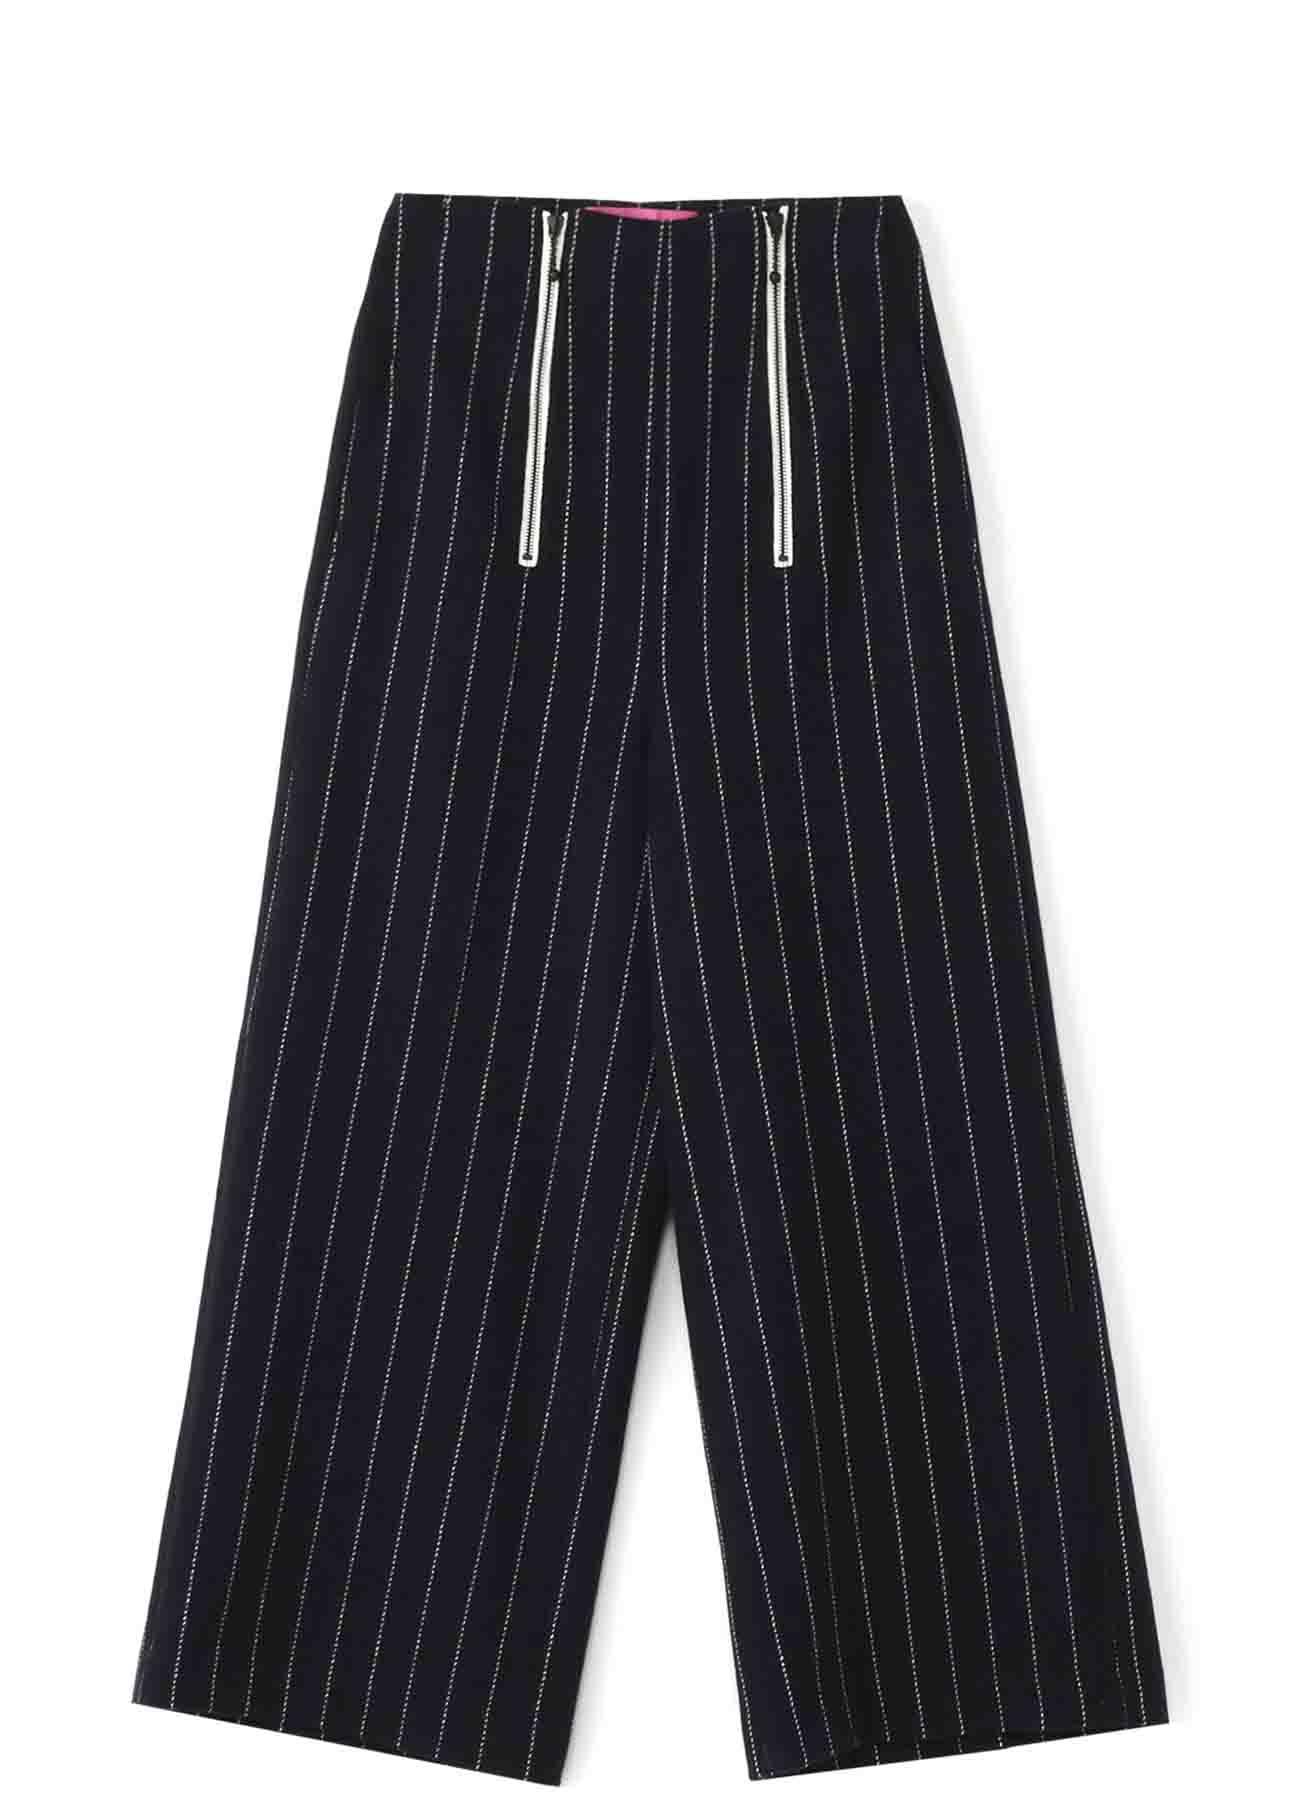 Y'sPINK 再生羊毛条纹长裤